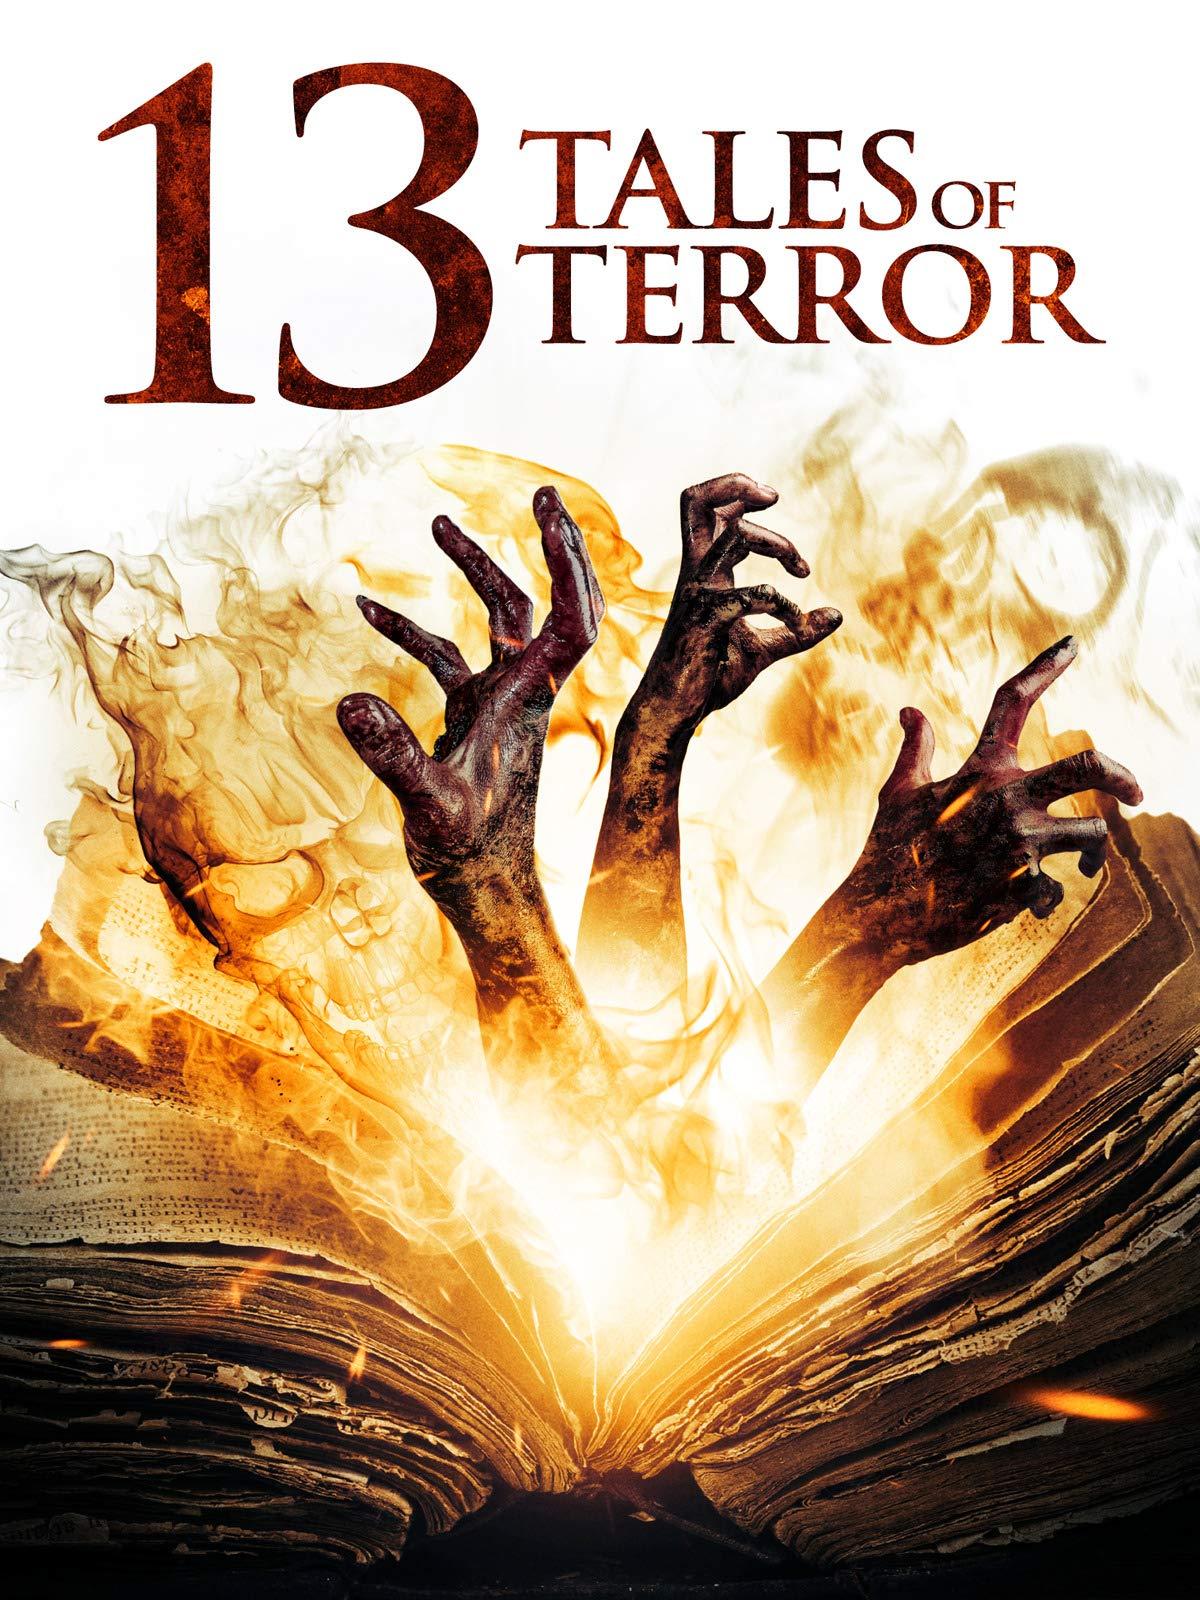 13 Tales of Terror